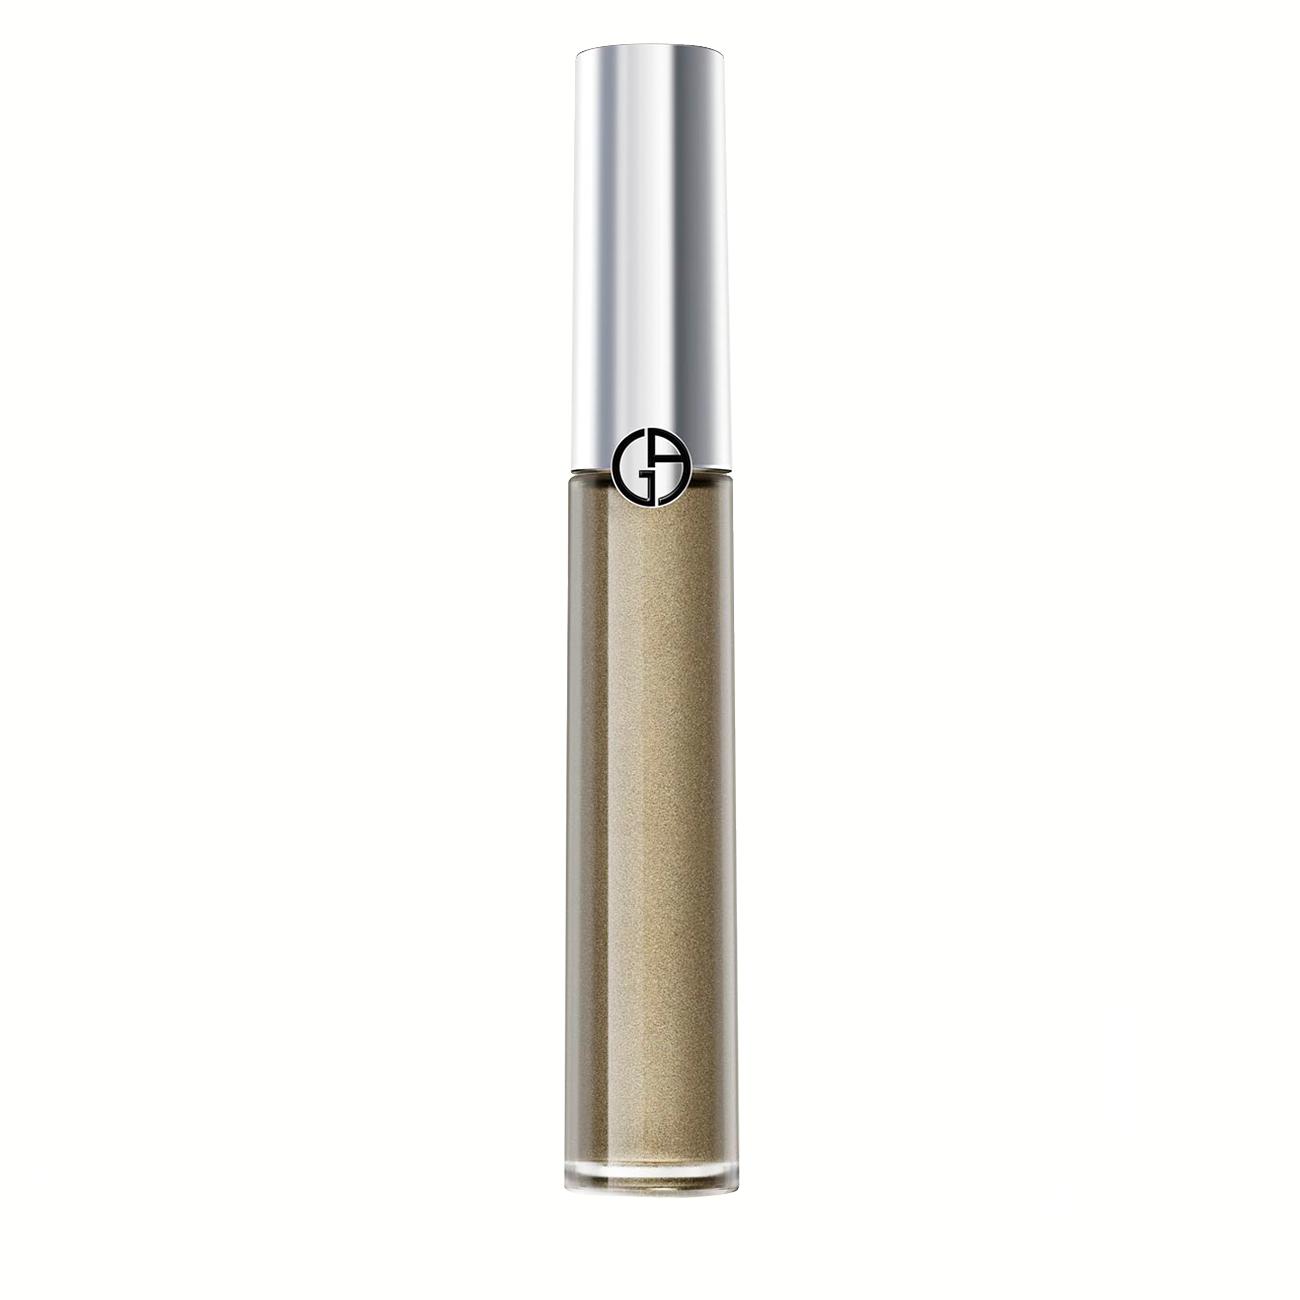 Eye Tint Eyeshadow 6 6.5ml Giorgio Armani imagine 2021 bestvalue.eu